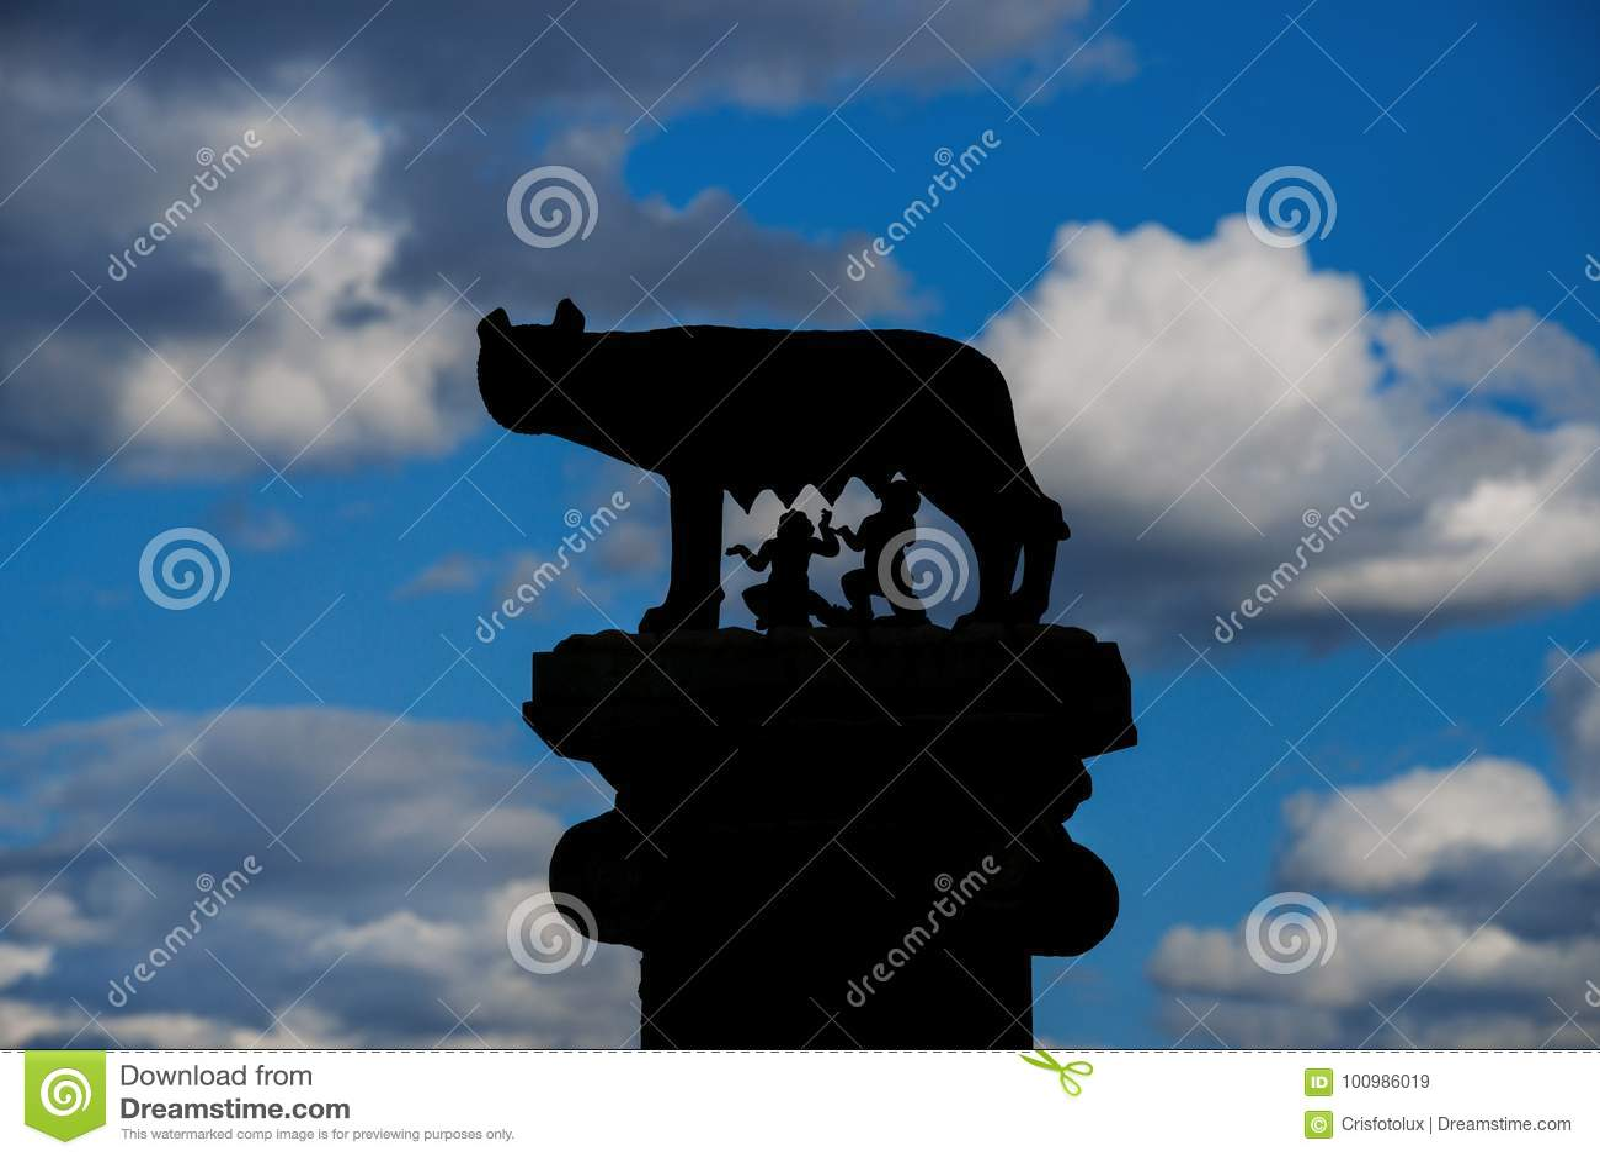 Capitoline wolf symbol of rome stock image image 100986019 capitoline wolf symbol of rome biocorpaavc